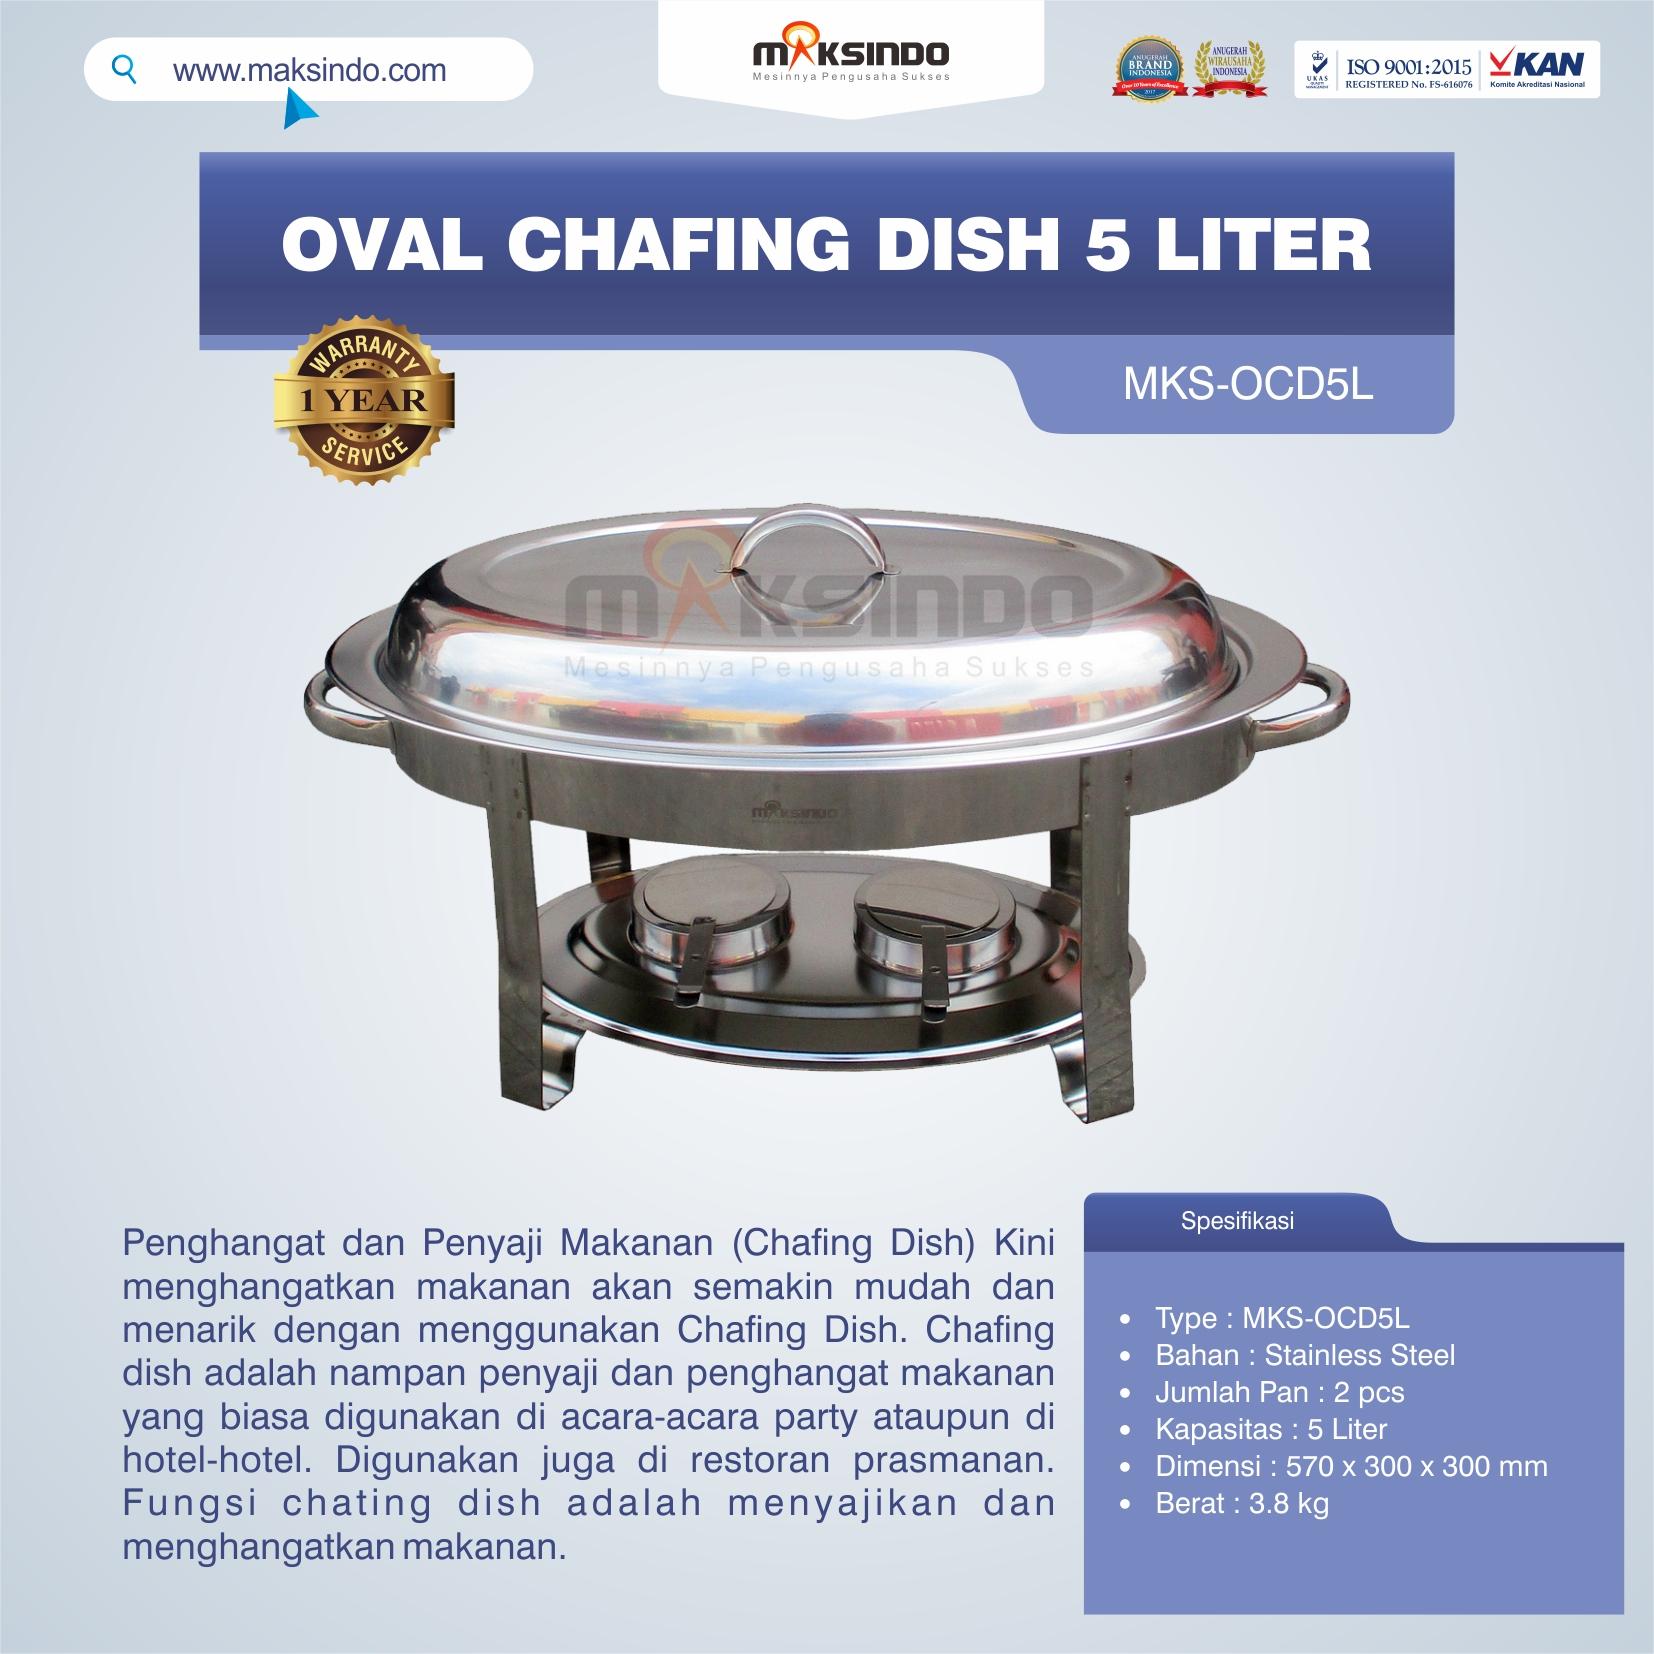 Jual Oval Chafing Dish 5 Liter di Bali